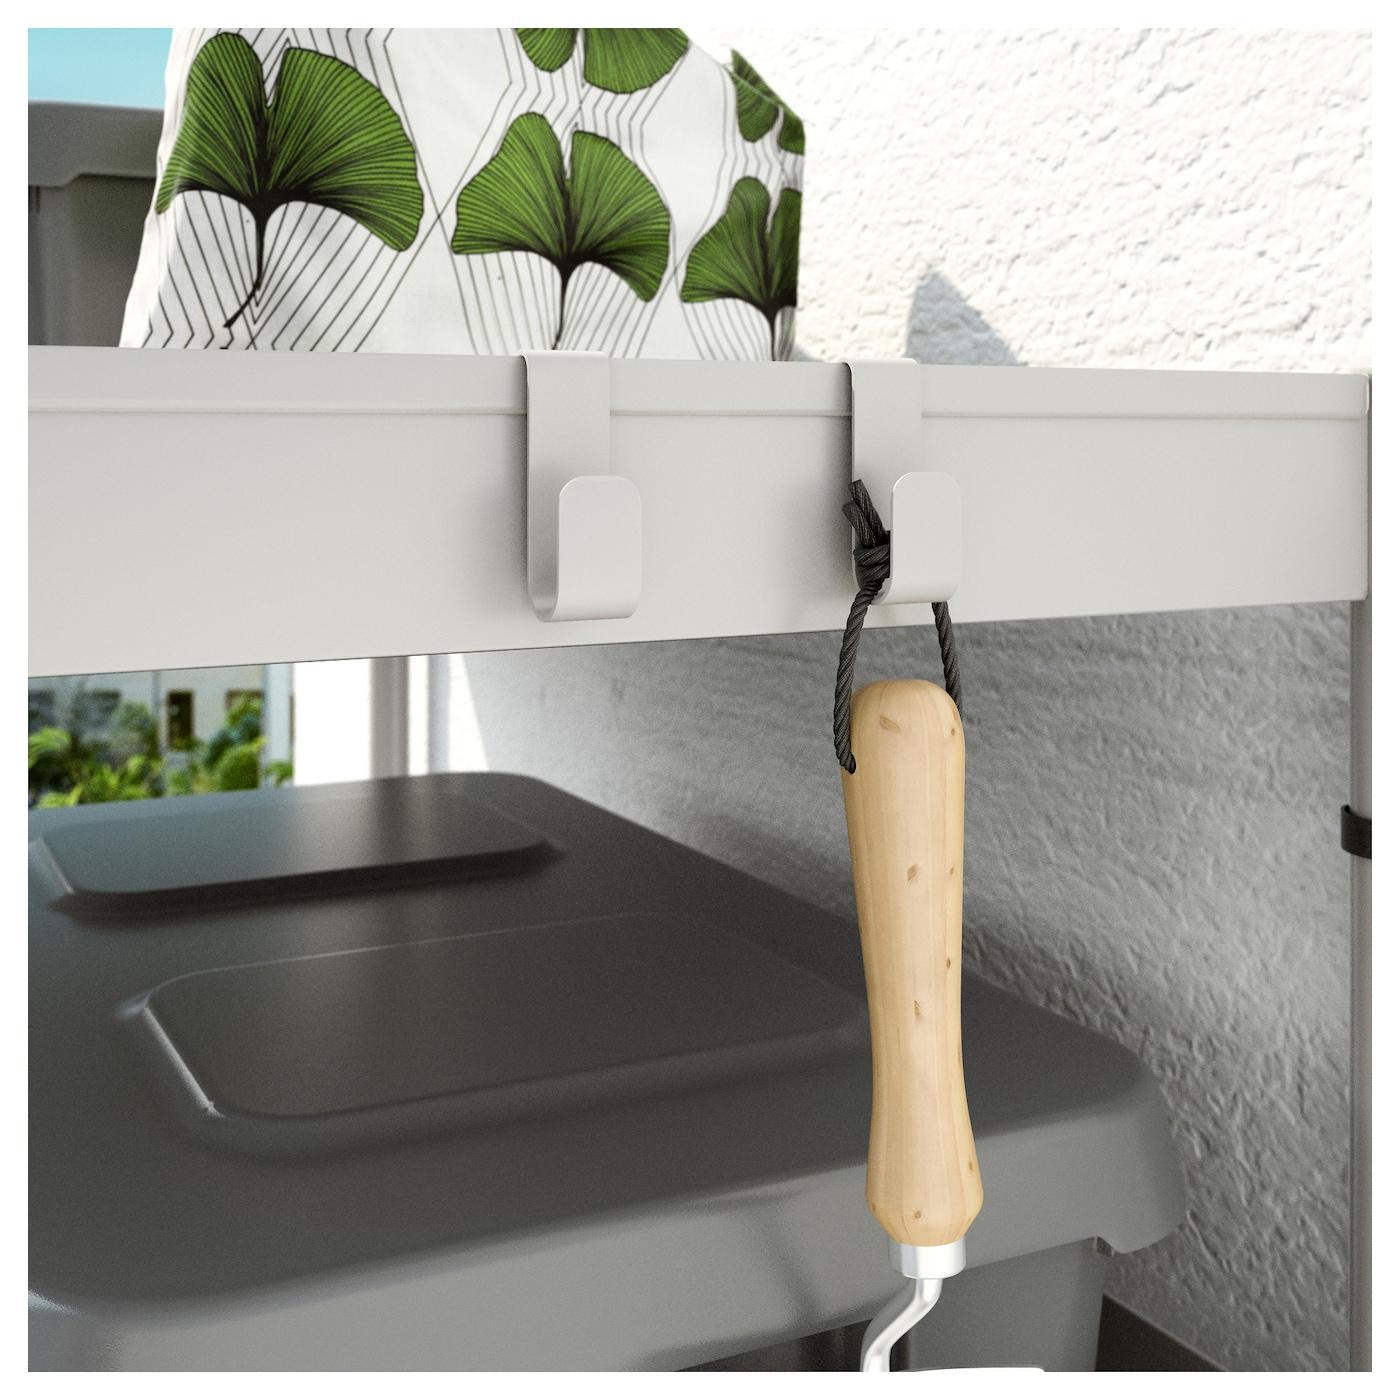 hind tag re int rieur ext rieur gris 78x158 cm ikea. Black Bedroom Furniture Sets. Home Design Ideas